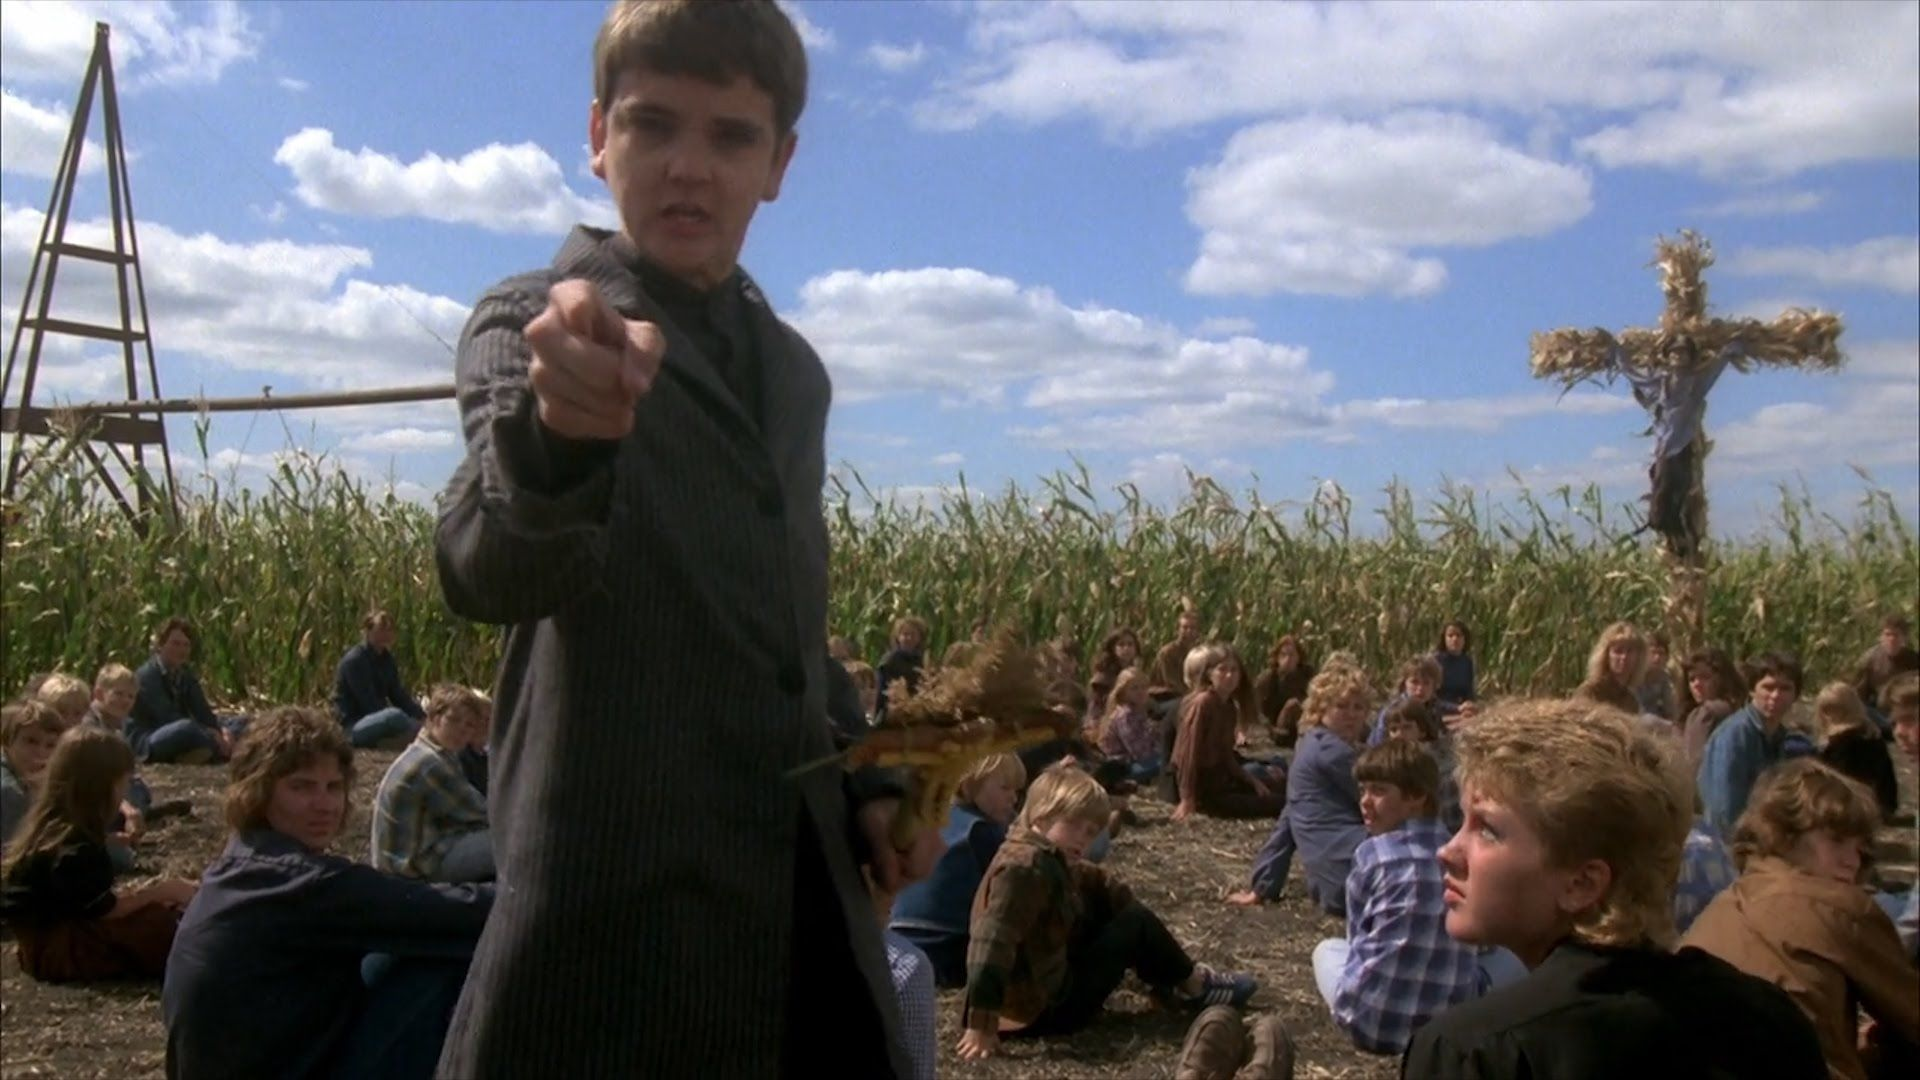 The children of 'Children of the Corn'